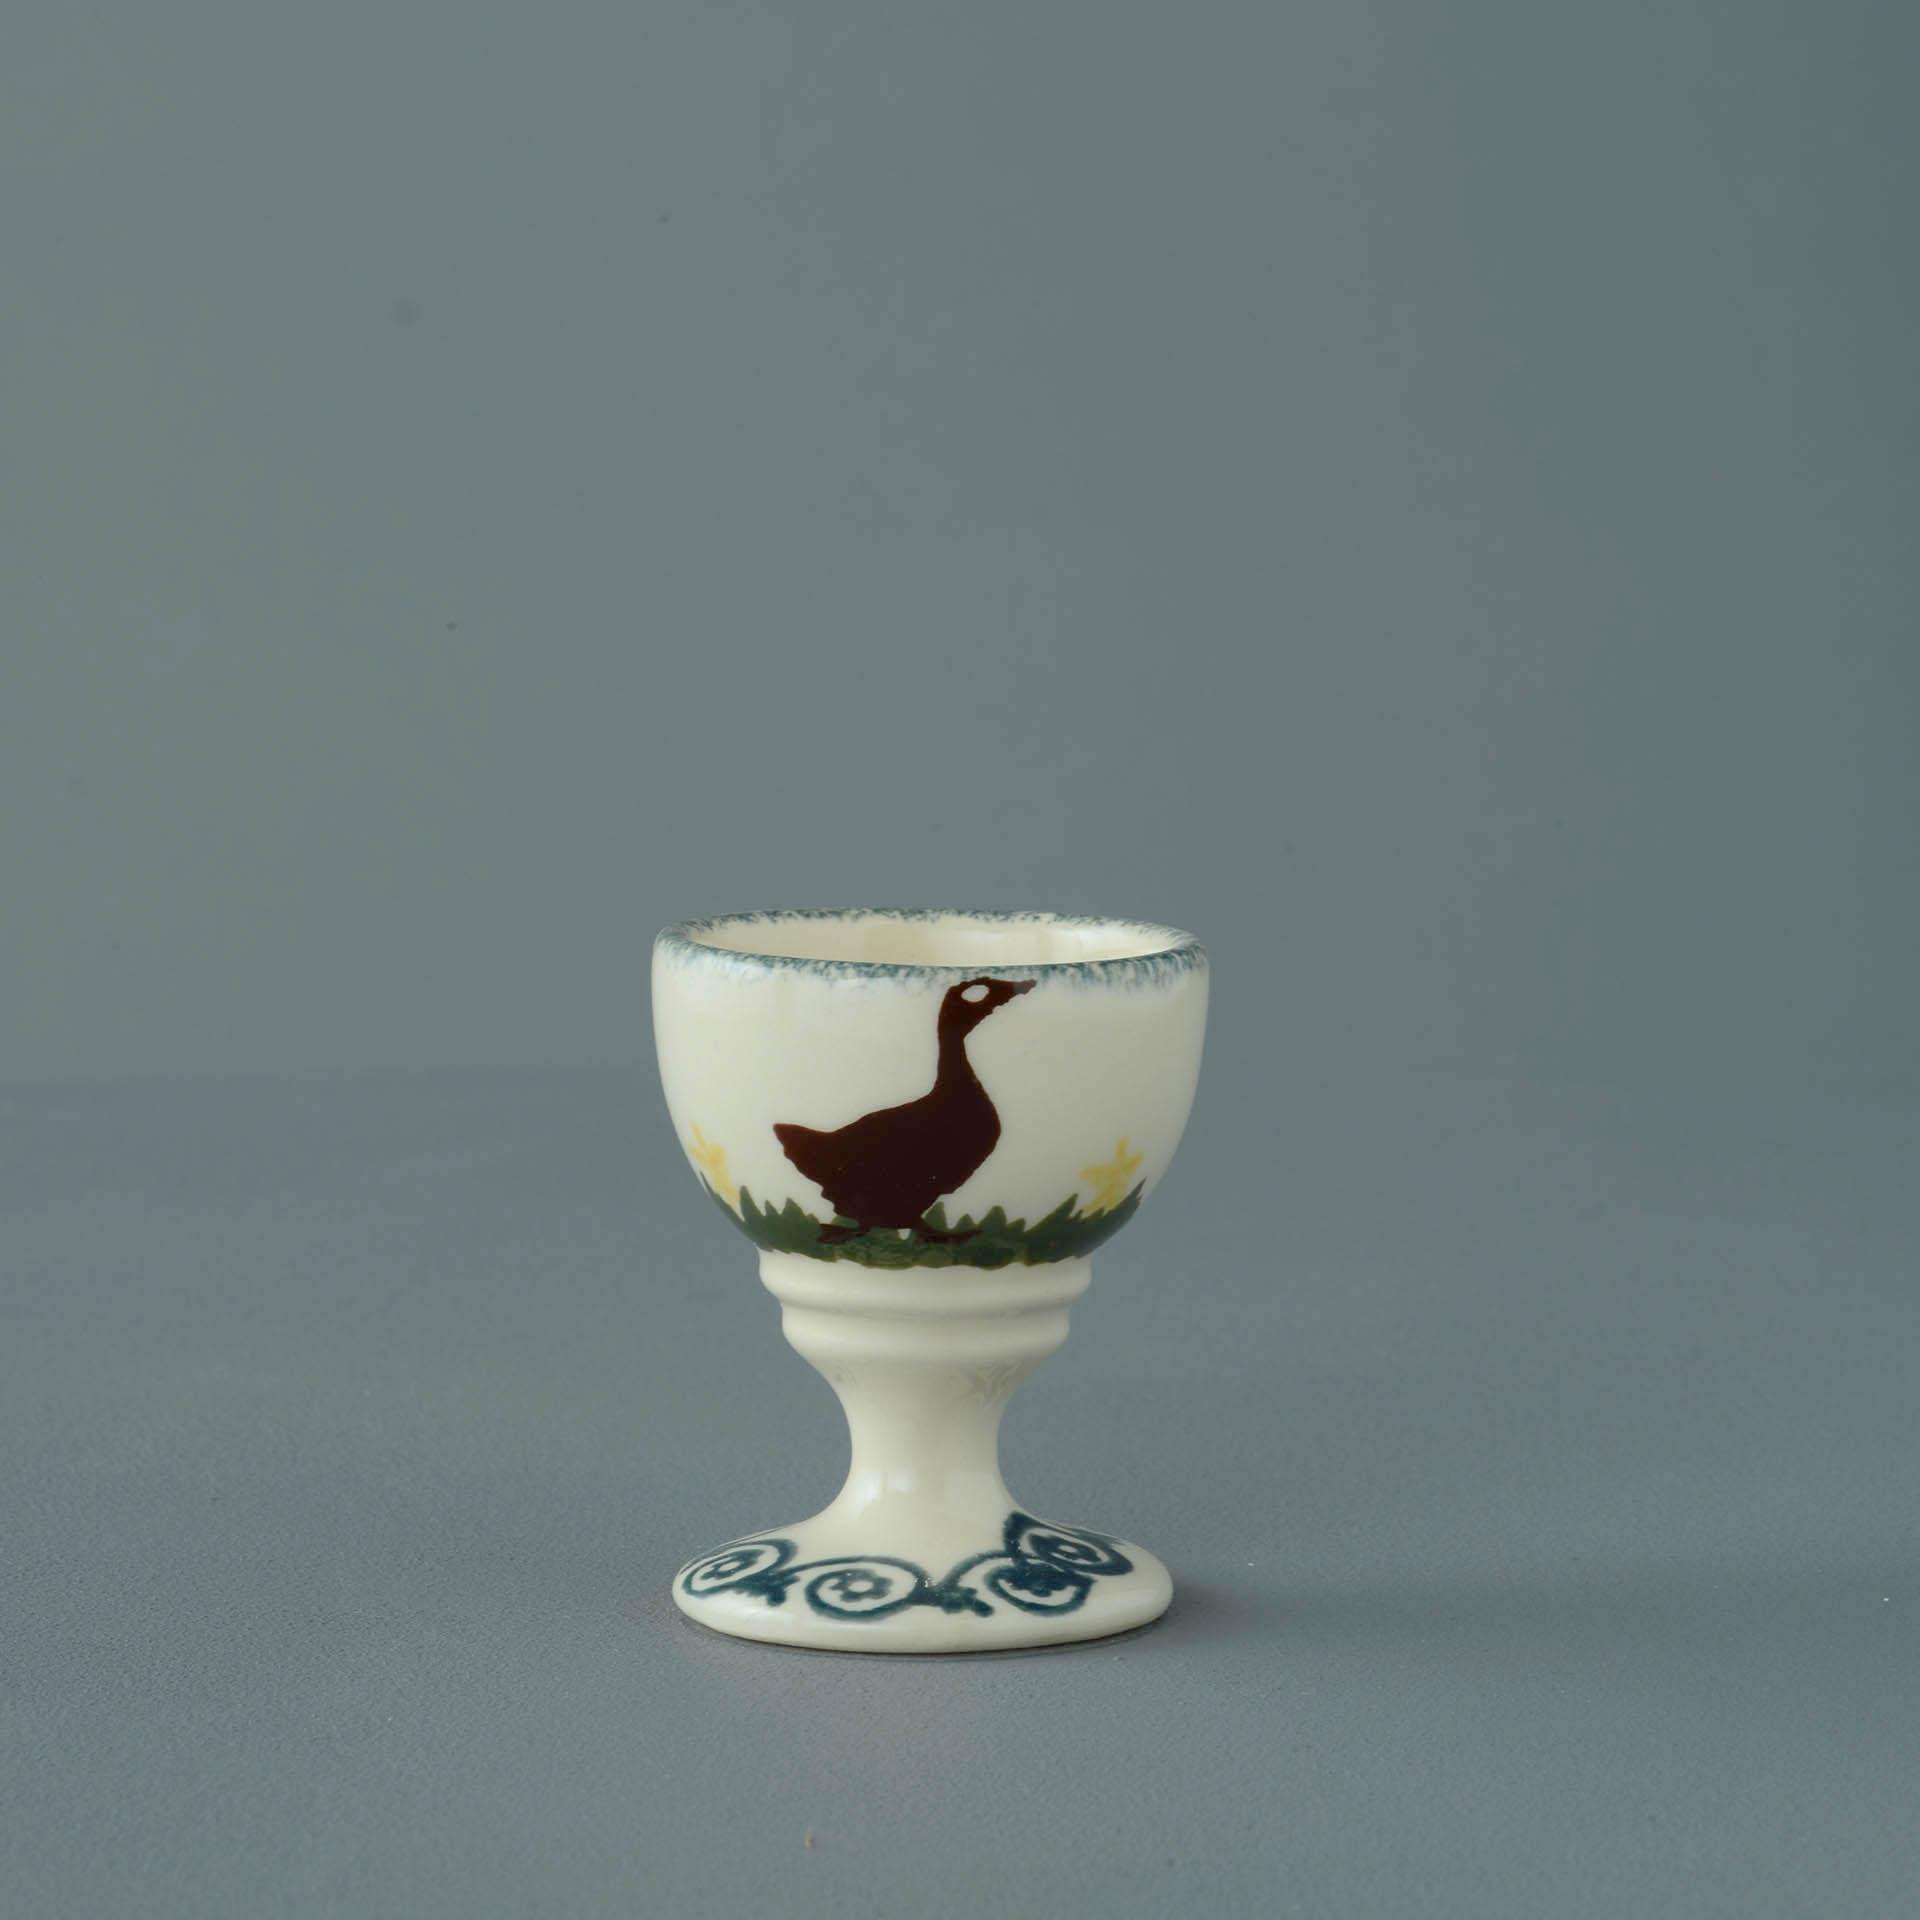 Ducks Egg cup 6.3 x 5.2cm